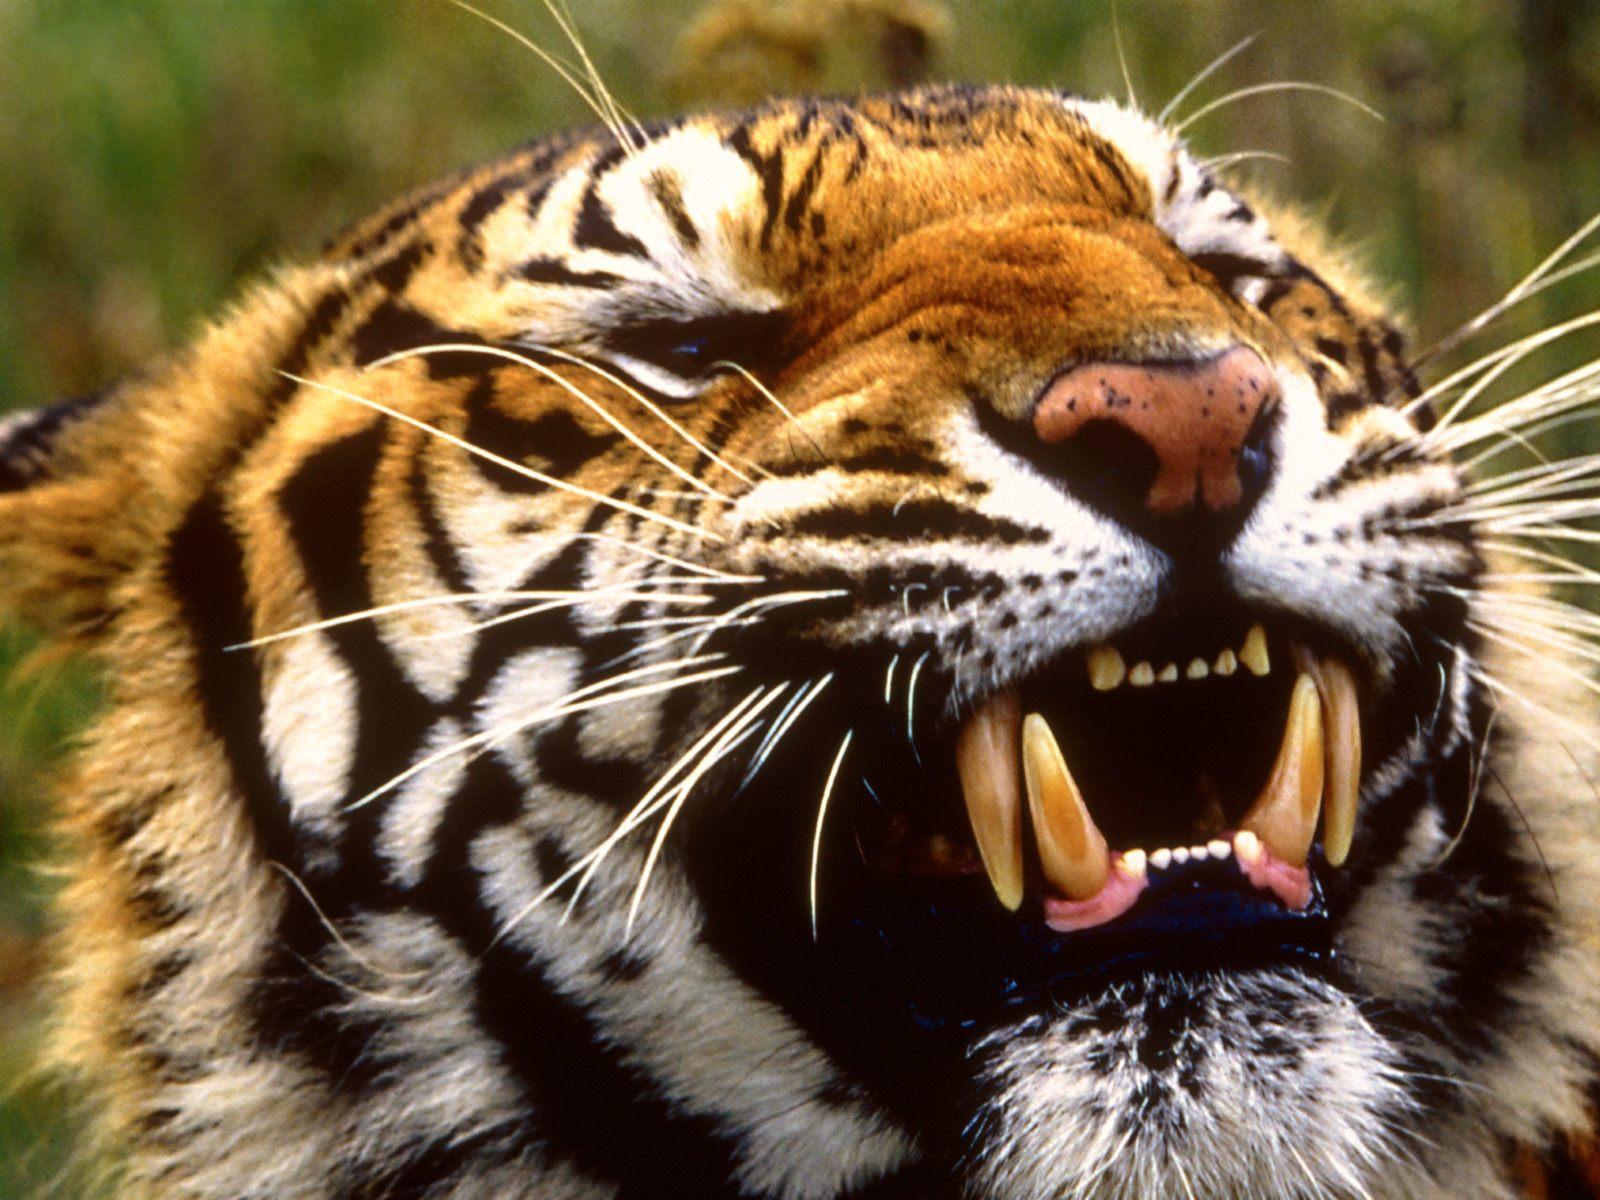 http://3.bp.blogspot.com/-gJW2Mz-s6bw/TgOAFdgtSJI/AAAAAAAAA1c/E2Q6vkSKzRE/s1600/bengal-tiger-wallpaper.jpg